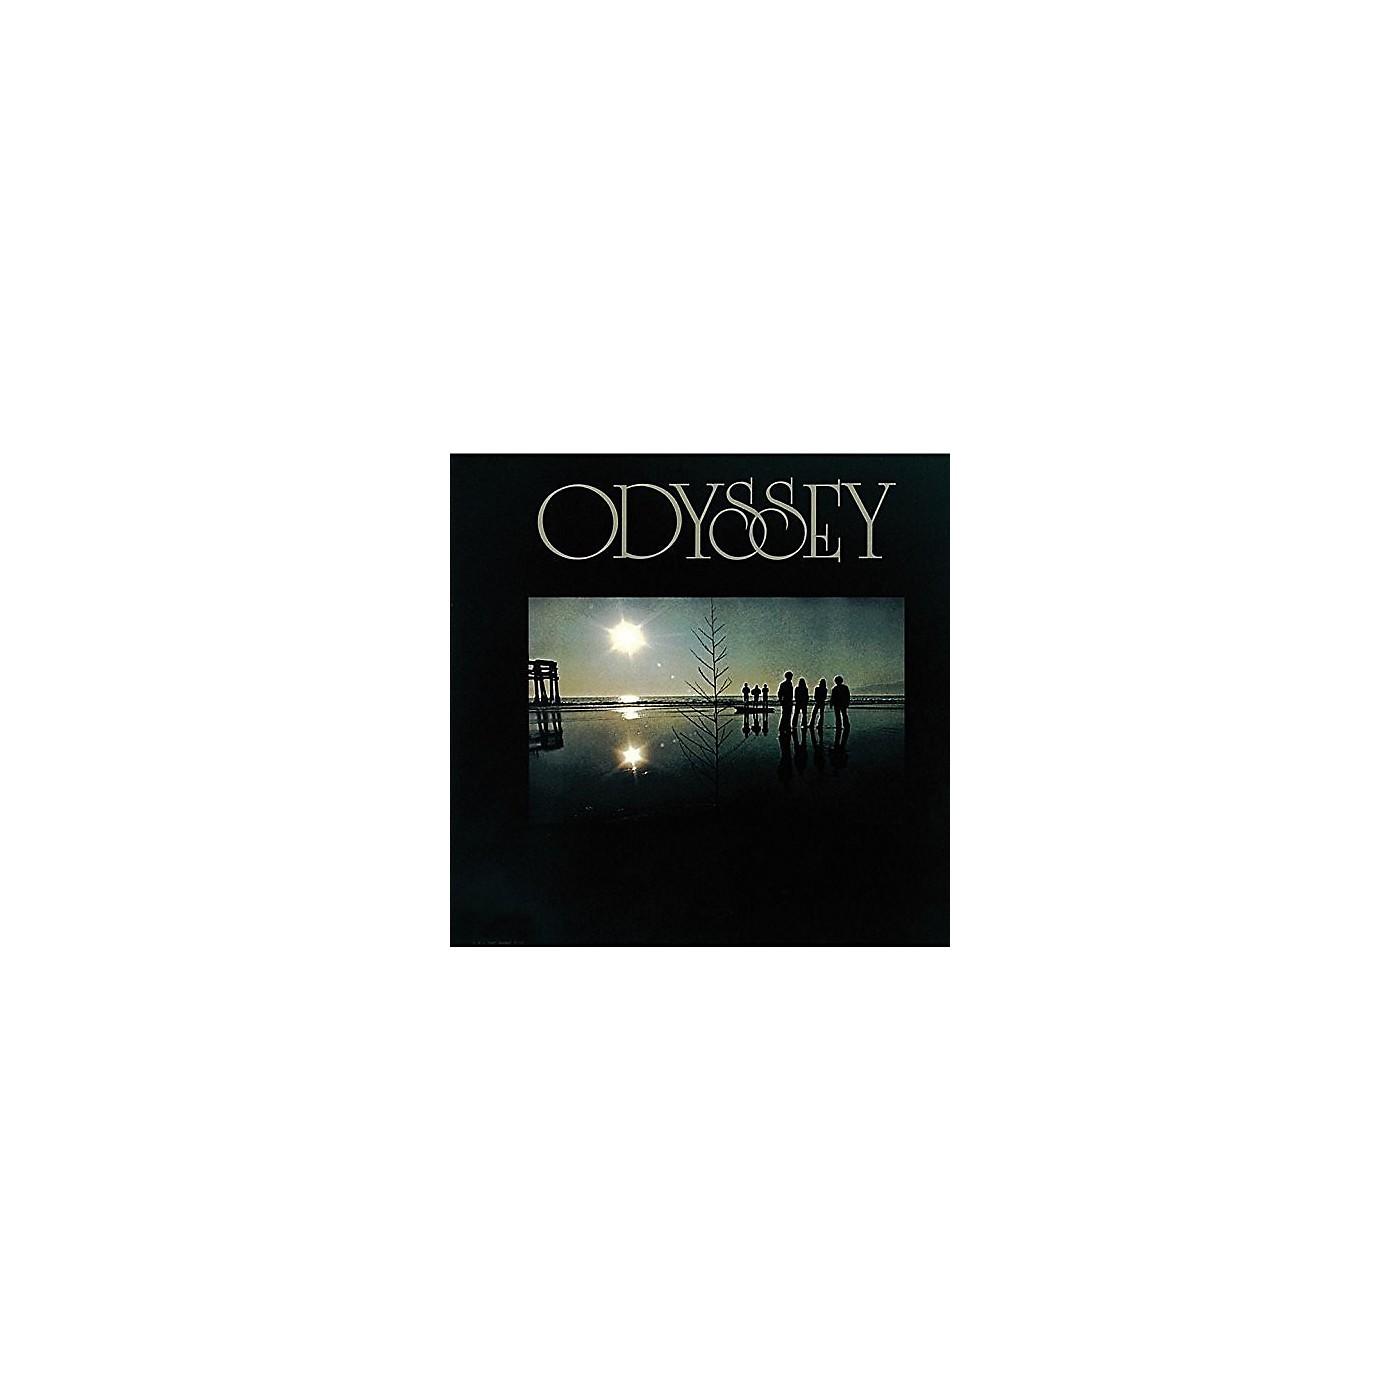 Alliance Odyssey - Odyssey thumbnail